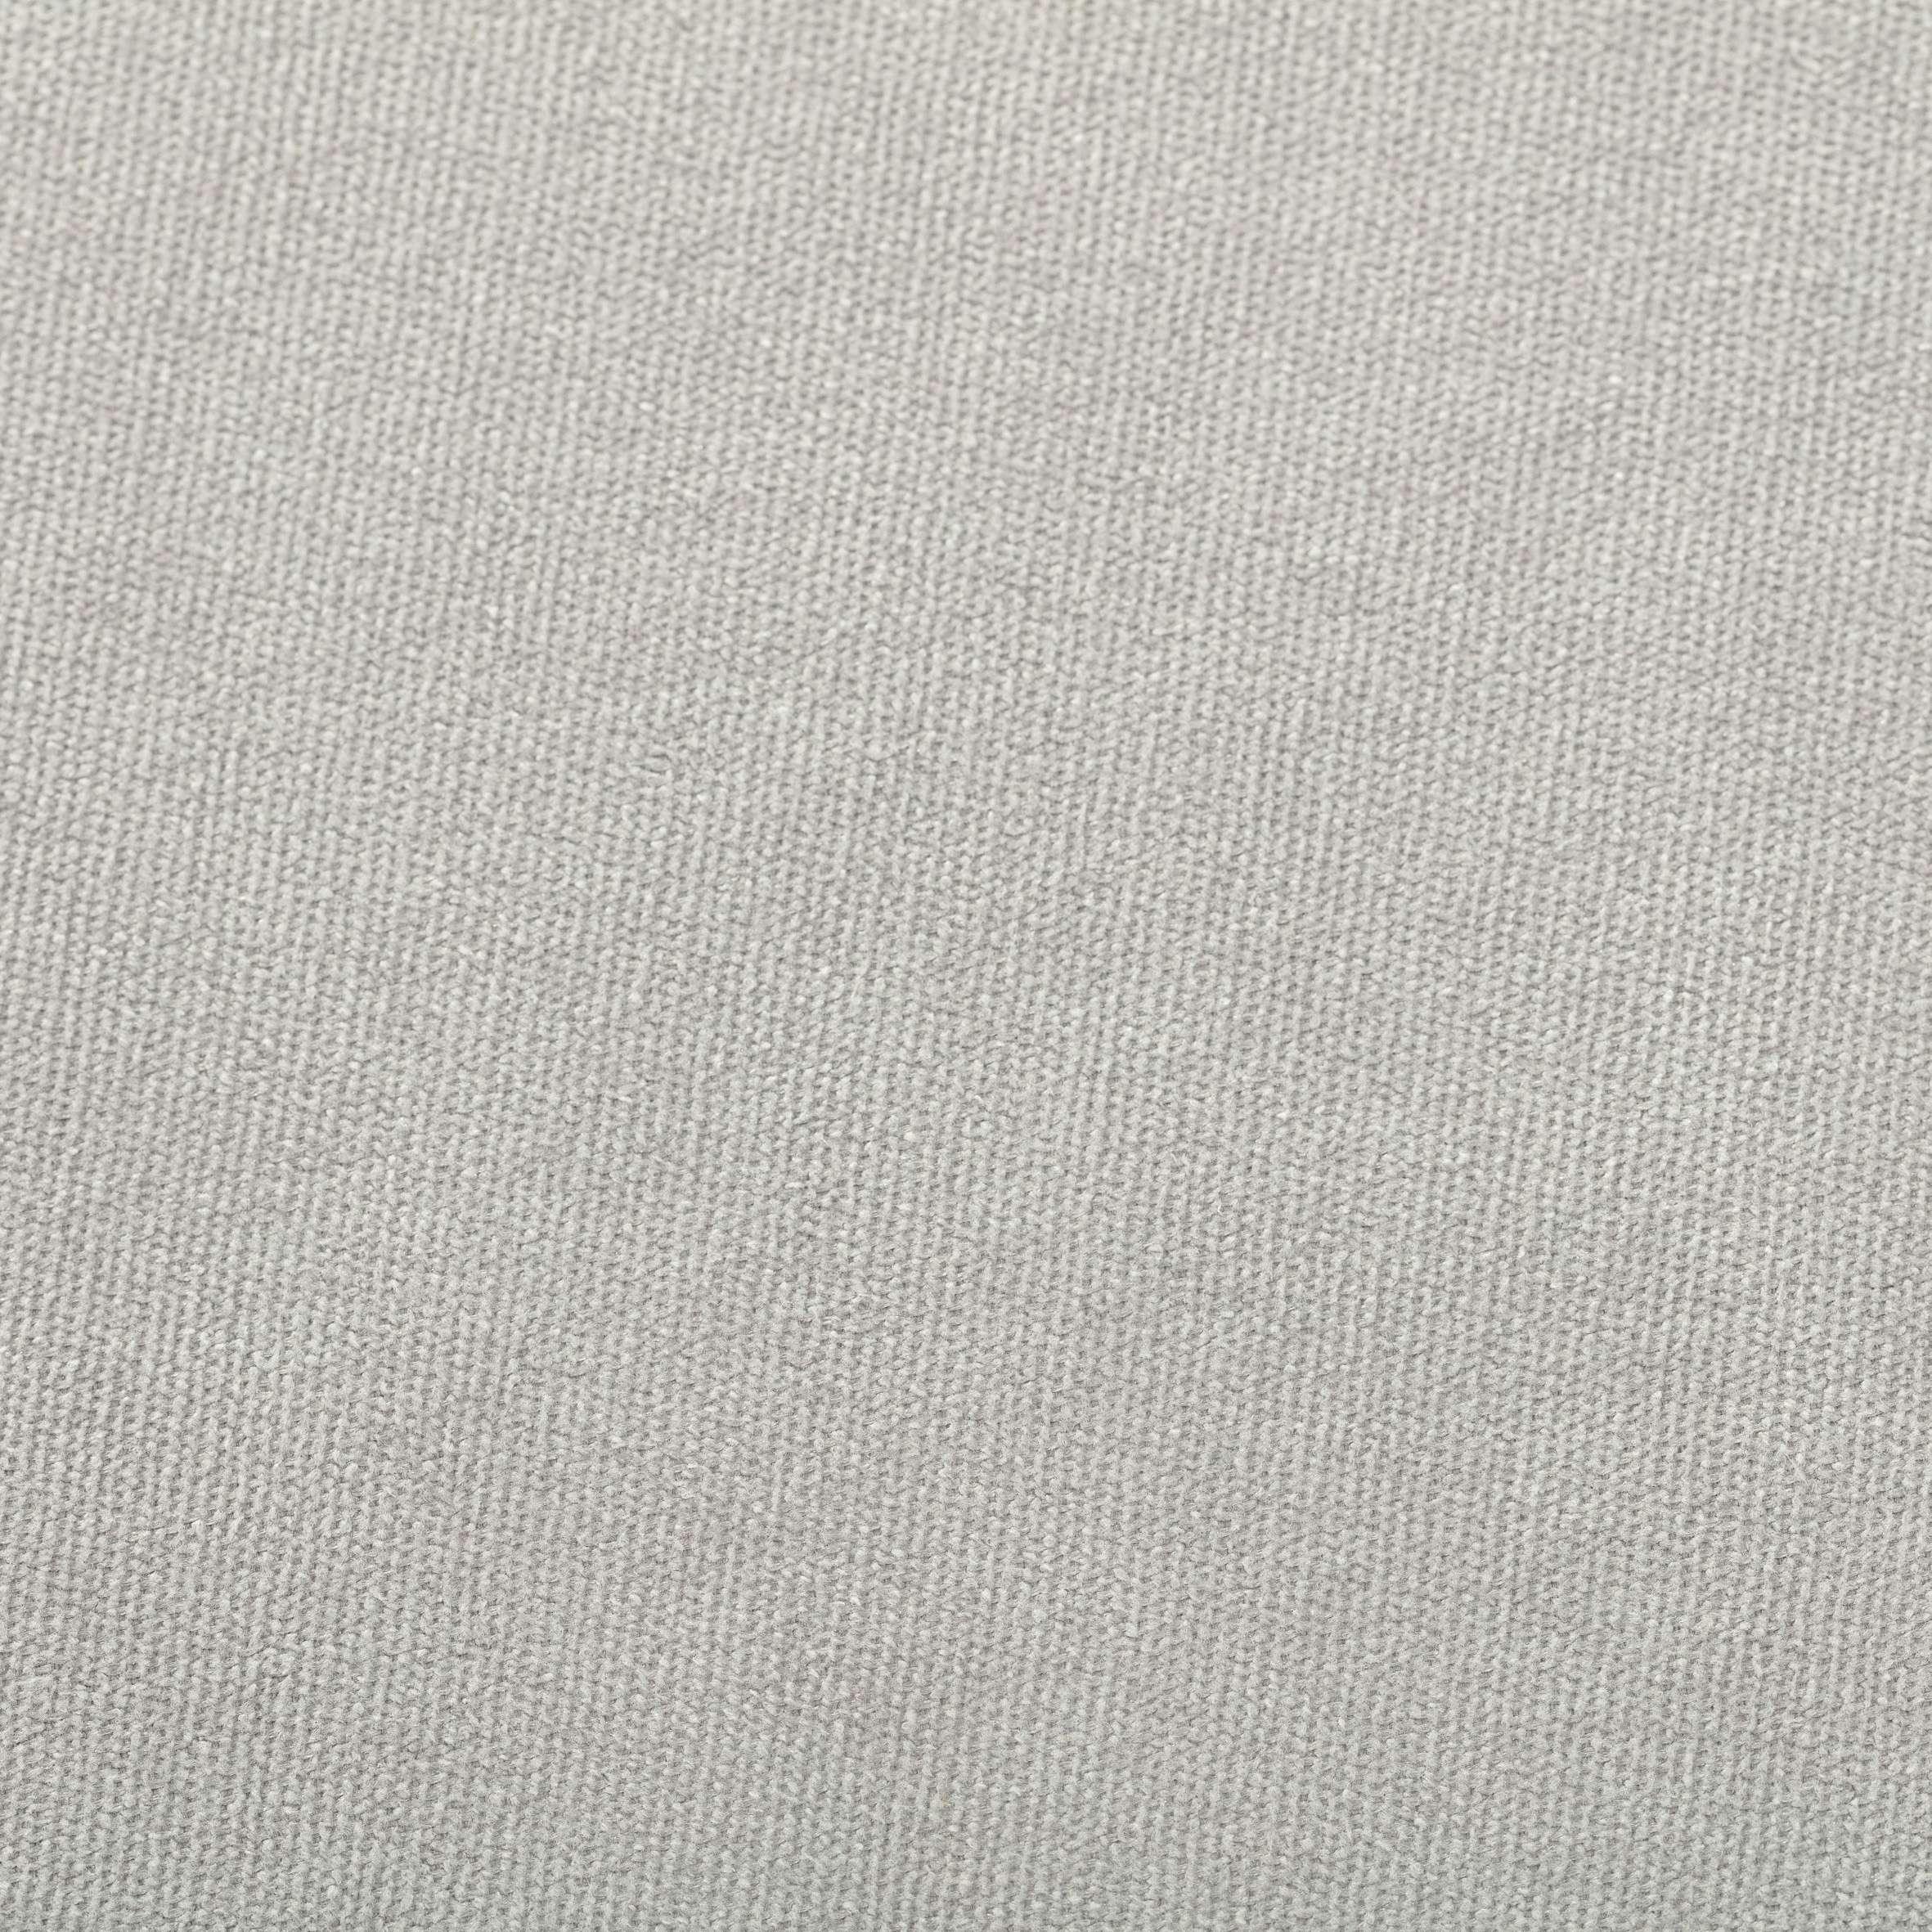 Fertigvorhang BASIC mit Kräuselband 140x280cm, Chenille hellgrau